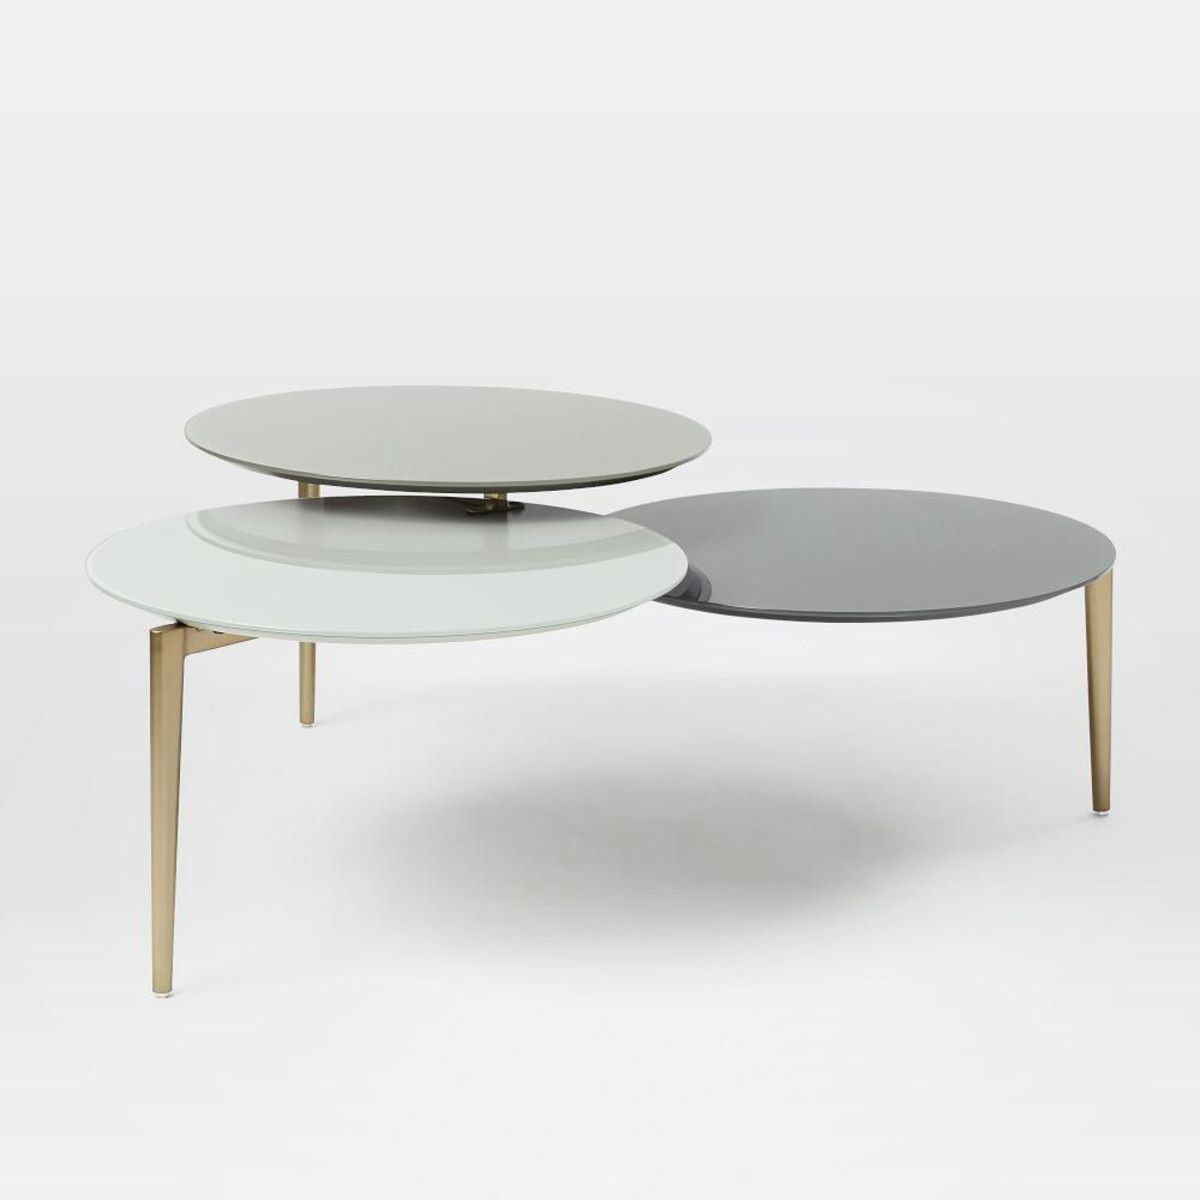 Treble Coffee Table West Elm Au Modern Glass Coffee Table Coffee Table Modern Wood Coffee Table [ 1200 x 1200 Pixel ]